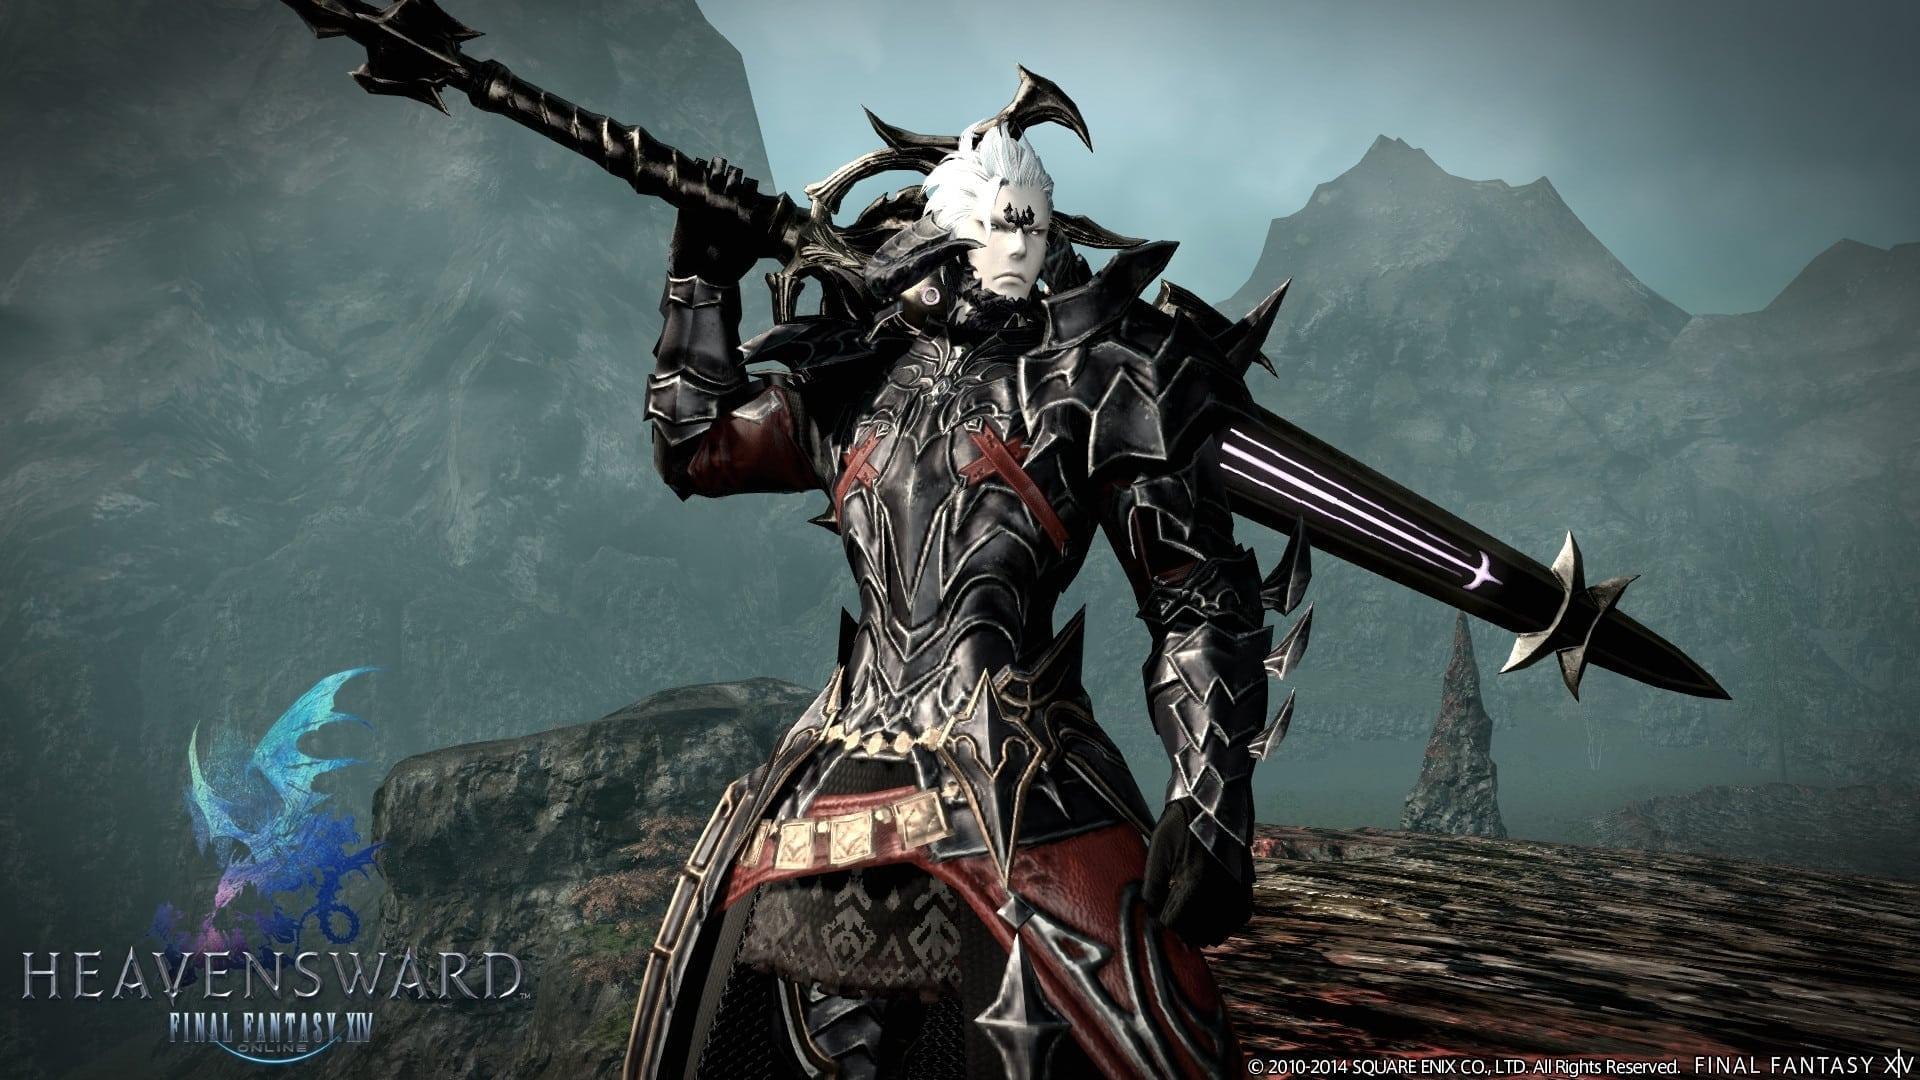 Final Fantasy XIV Heavensward - Au Ra Dark Knight image 2